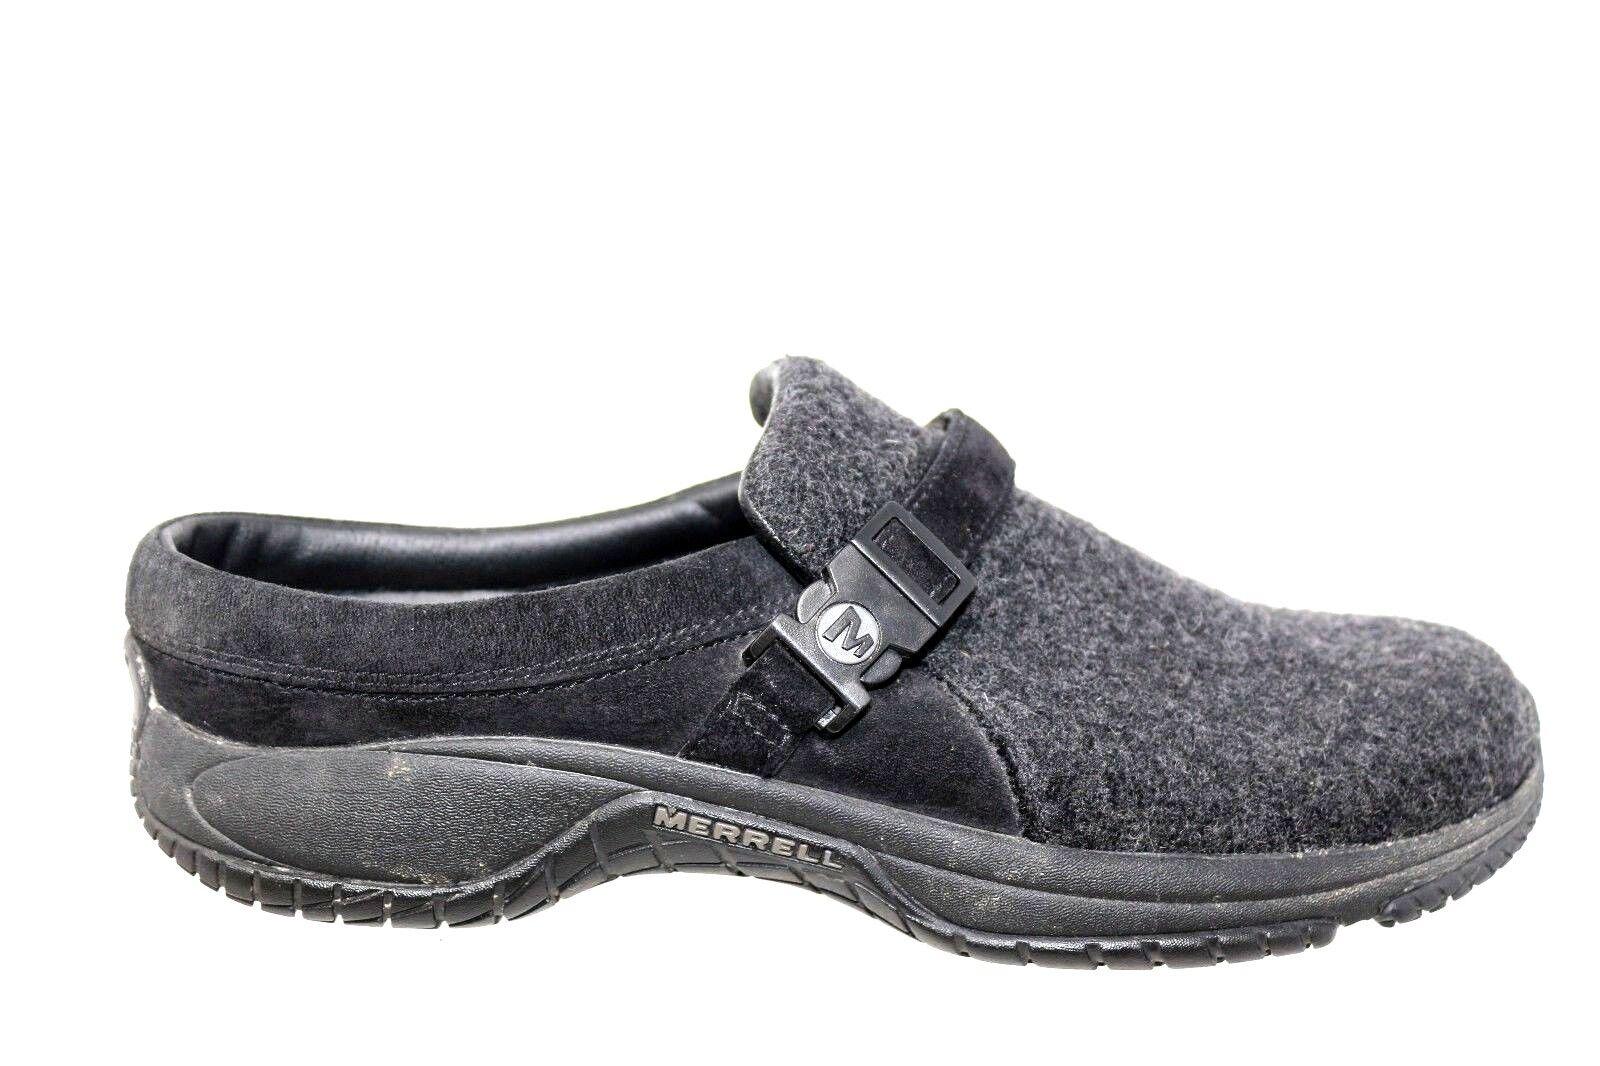 MERRELL Encore Groove Wool Black Wool Slip On Clog Shoes Women's Size 11